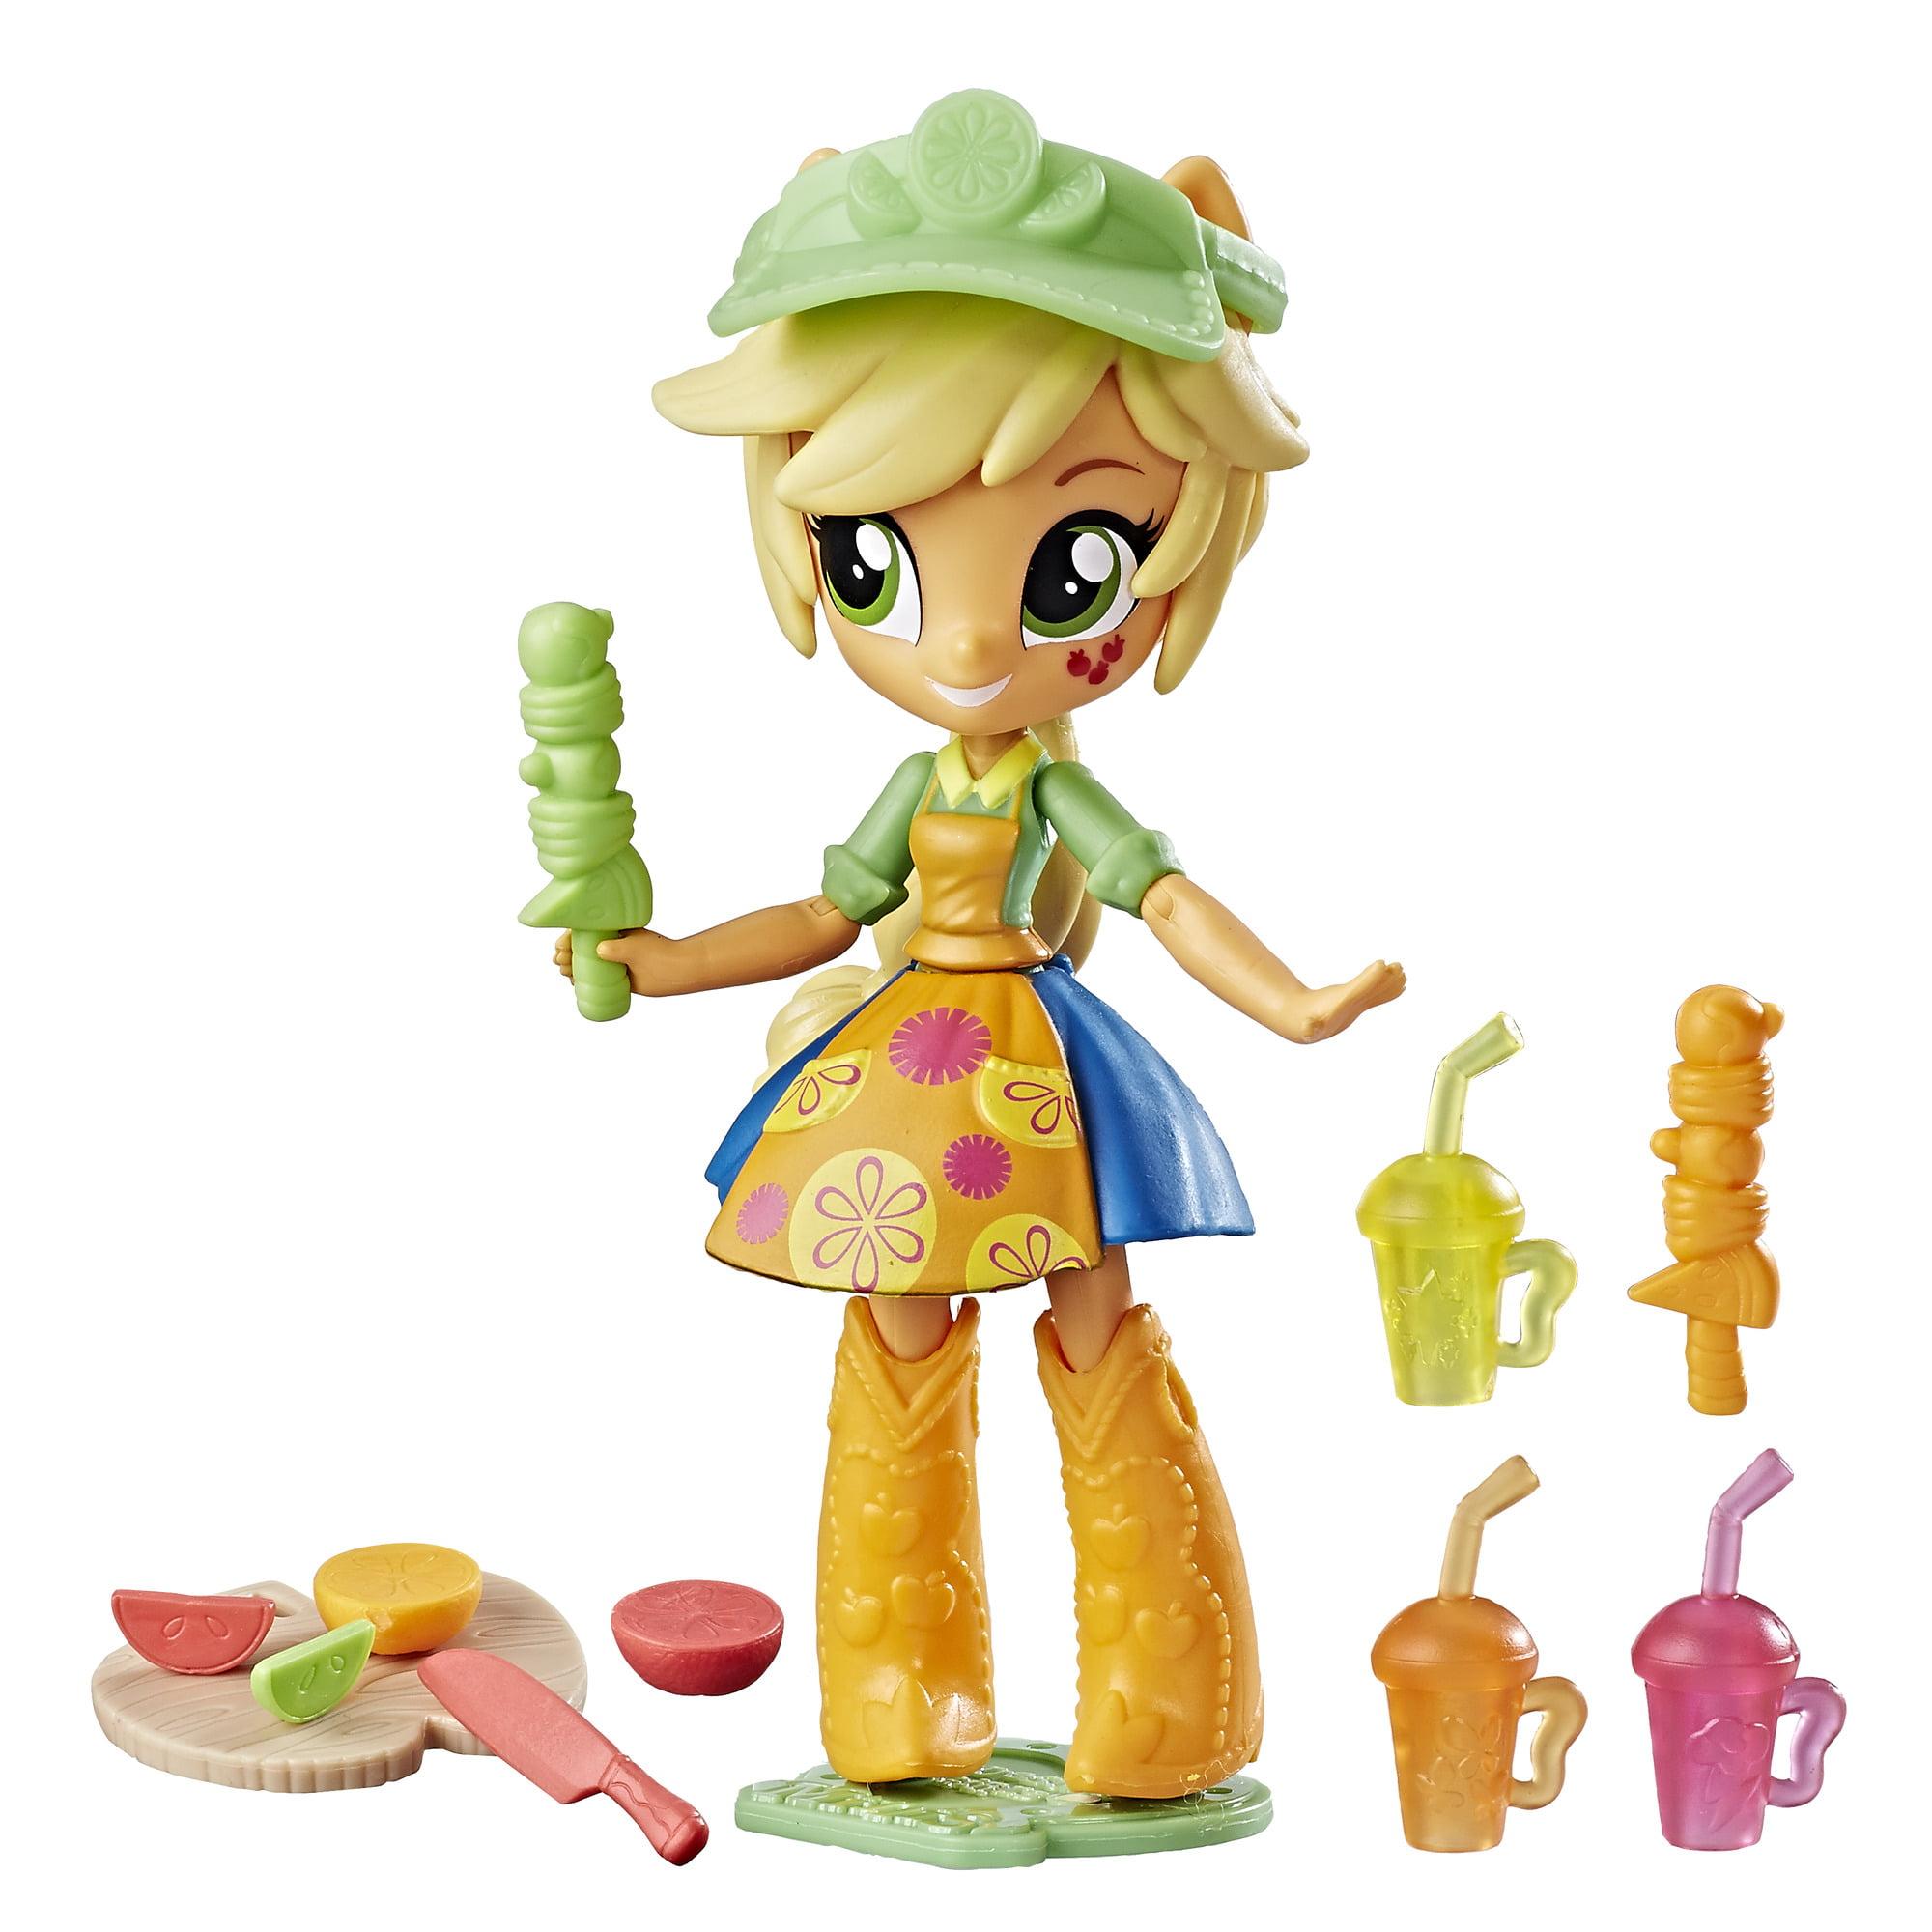 My Little Pony Equestria Girls Applejack Fruit Smoothies Shop Set by Hasbro